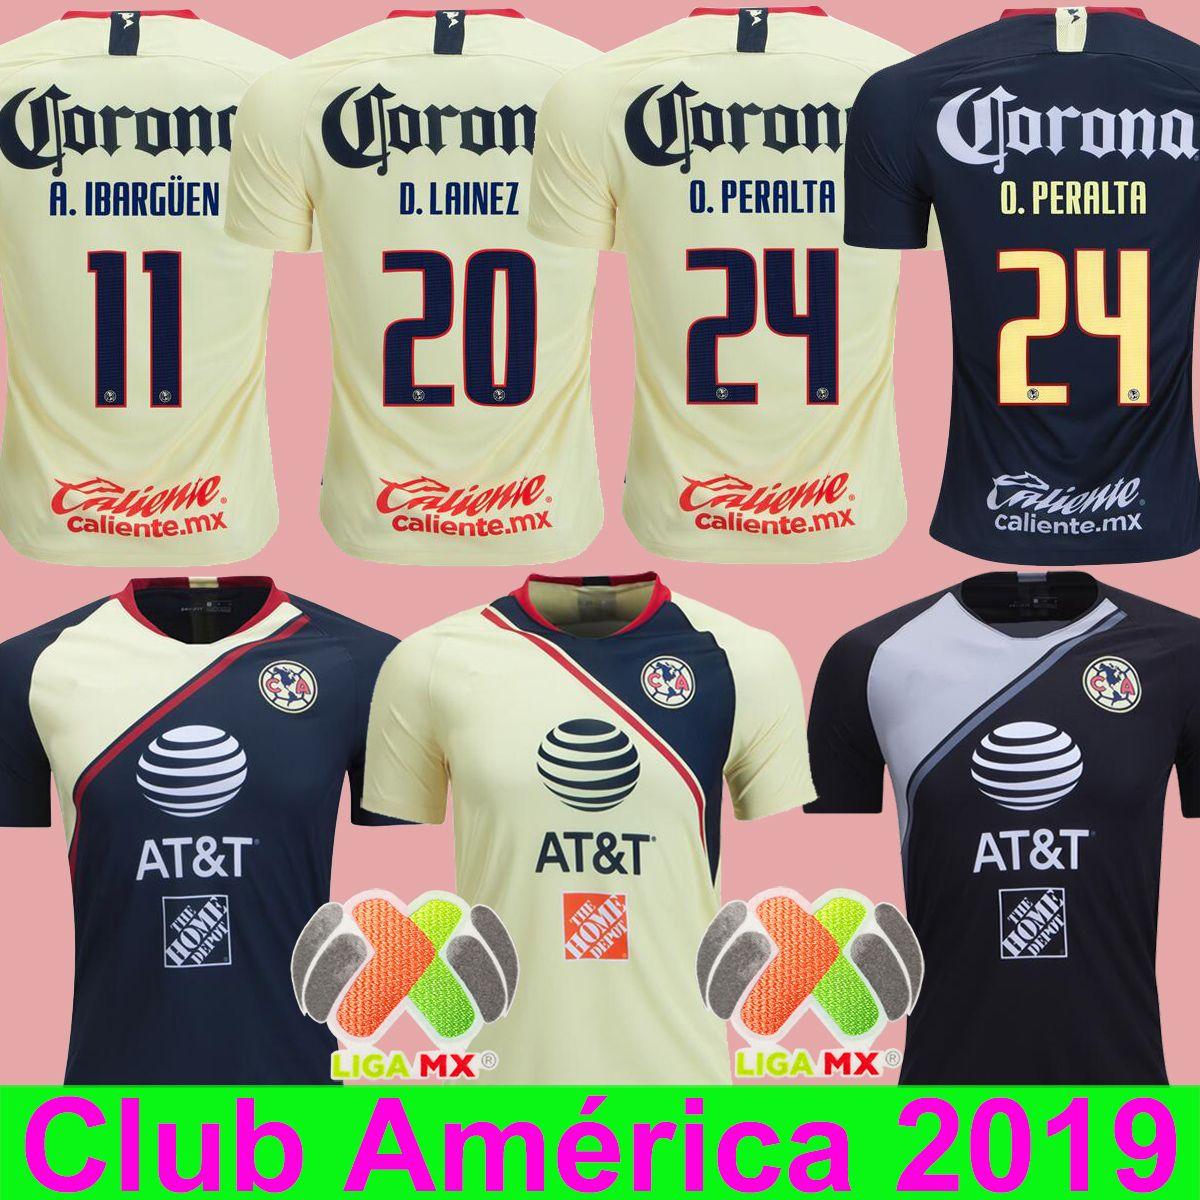 O.PERALTA 2018 2019 Club América Casa Amarillo Camiseta De Fútbol RODRIGUEZ  MENEZ MATHEUS Azul DOMINGUEZ IBARGÜEN Raimundo PERALTA 24 Camiseta Por  Soccer518 ... 5c475409447ca